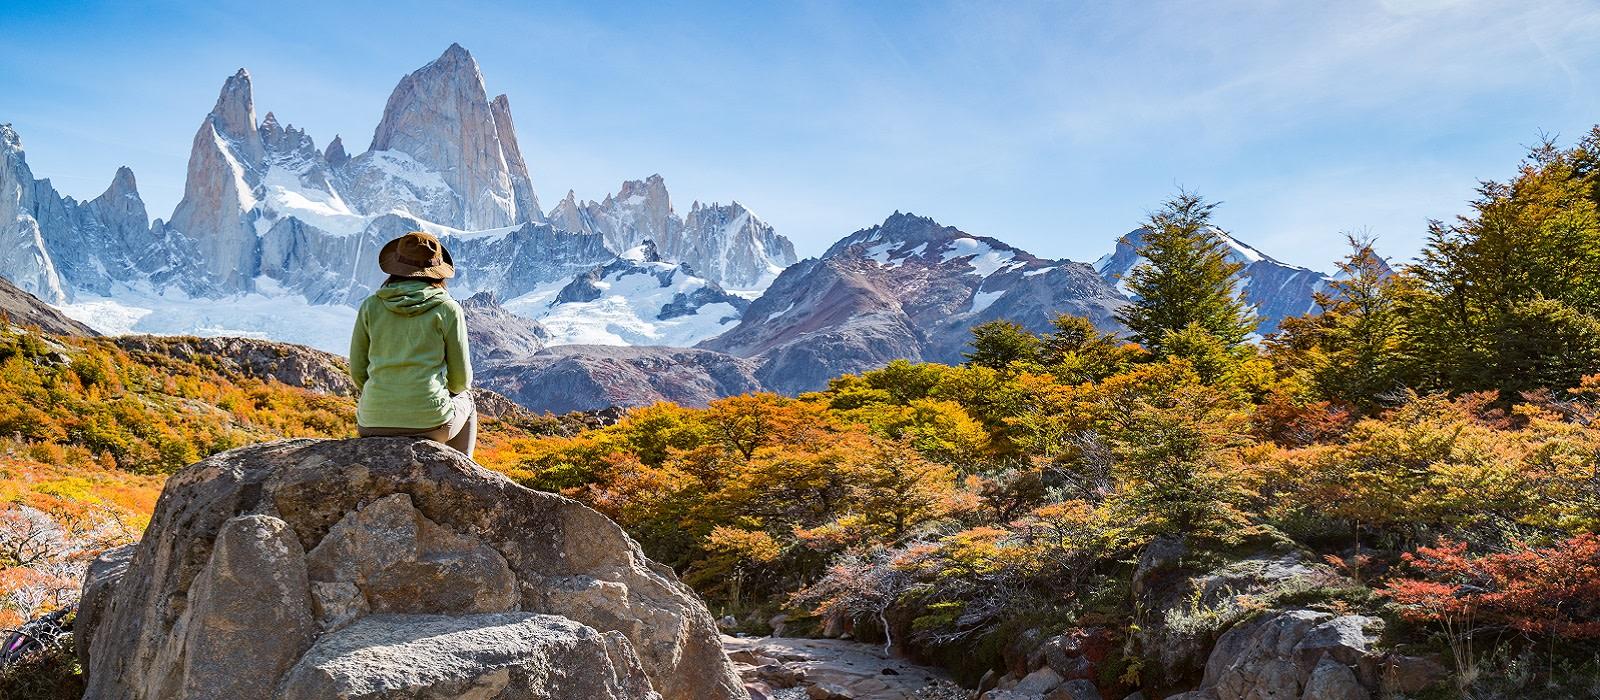 Fitz Roy - Patagonia - El Chalten - Argentina Tour - South America